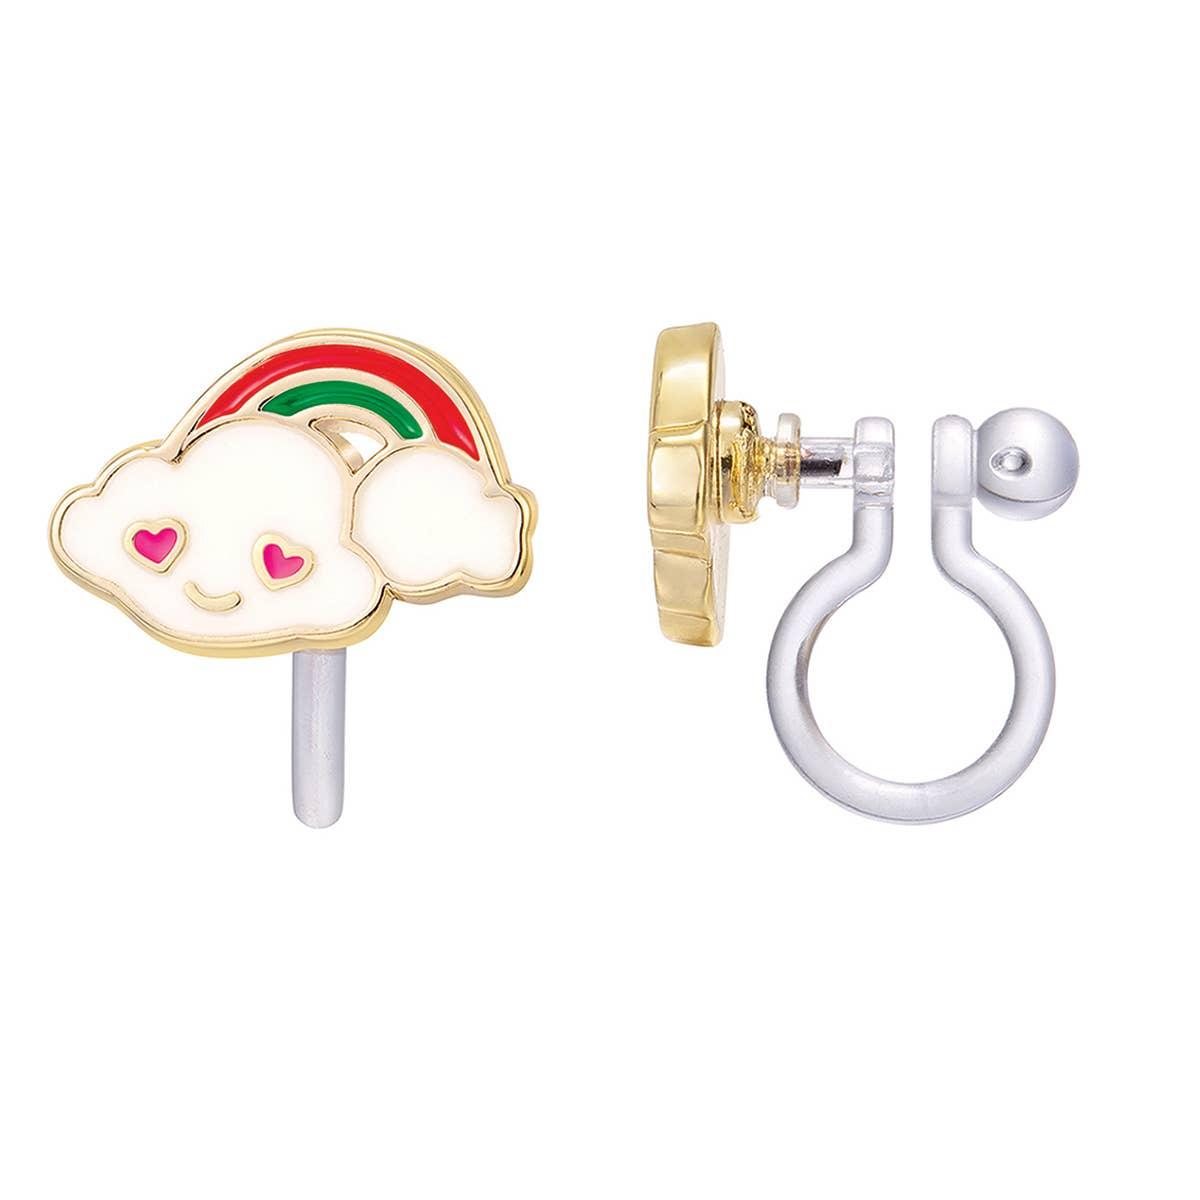 CLIP ON Cutie Earrings- Cloud Luvs Rainbow | Trada Marketplace